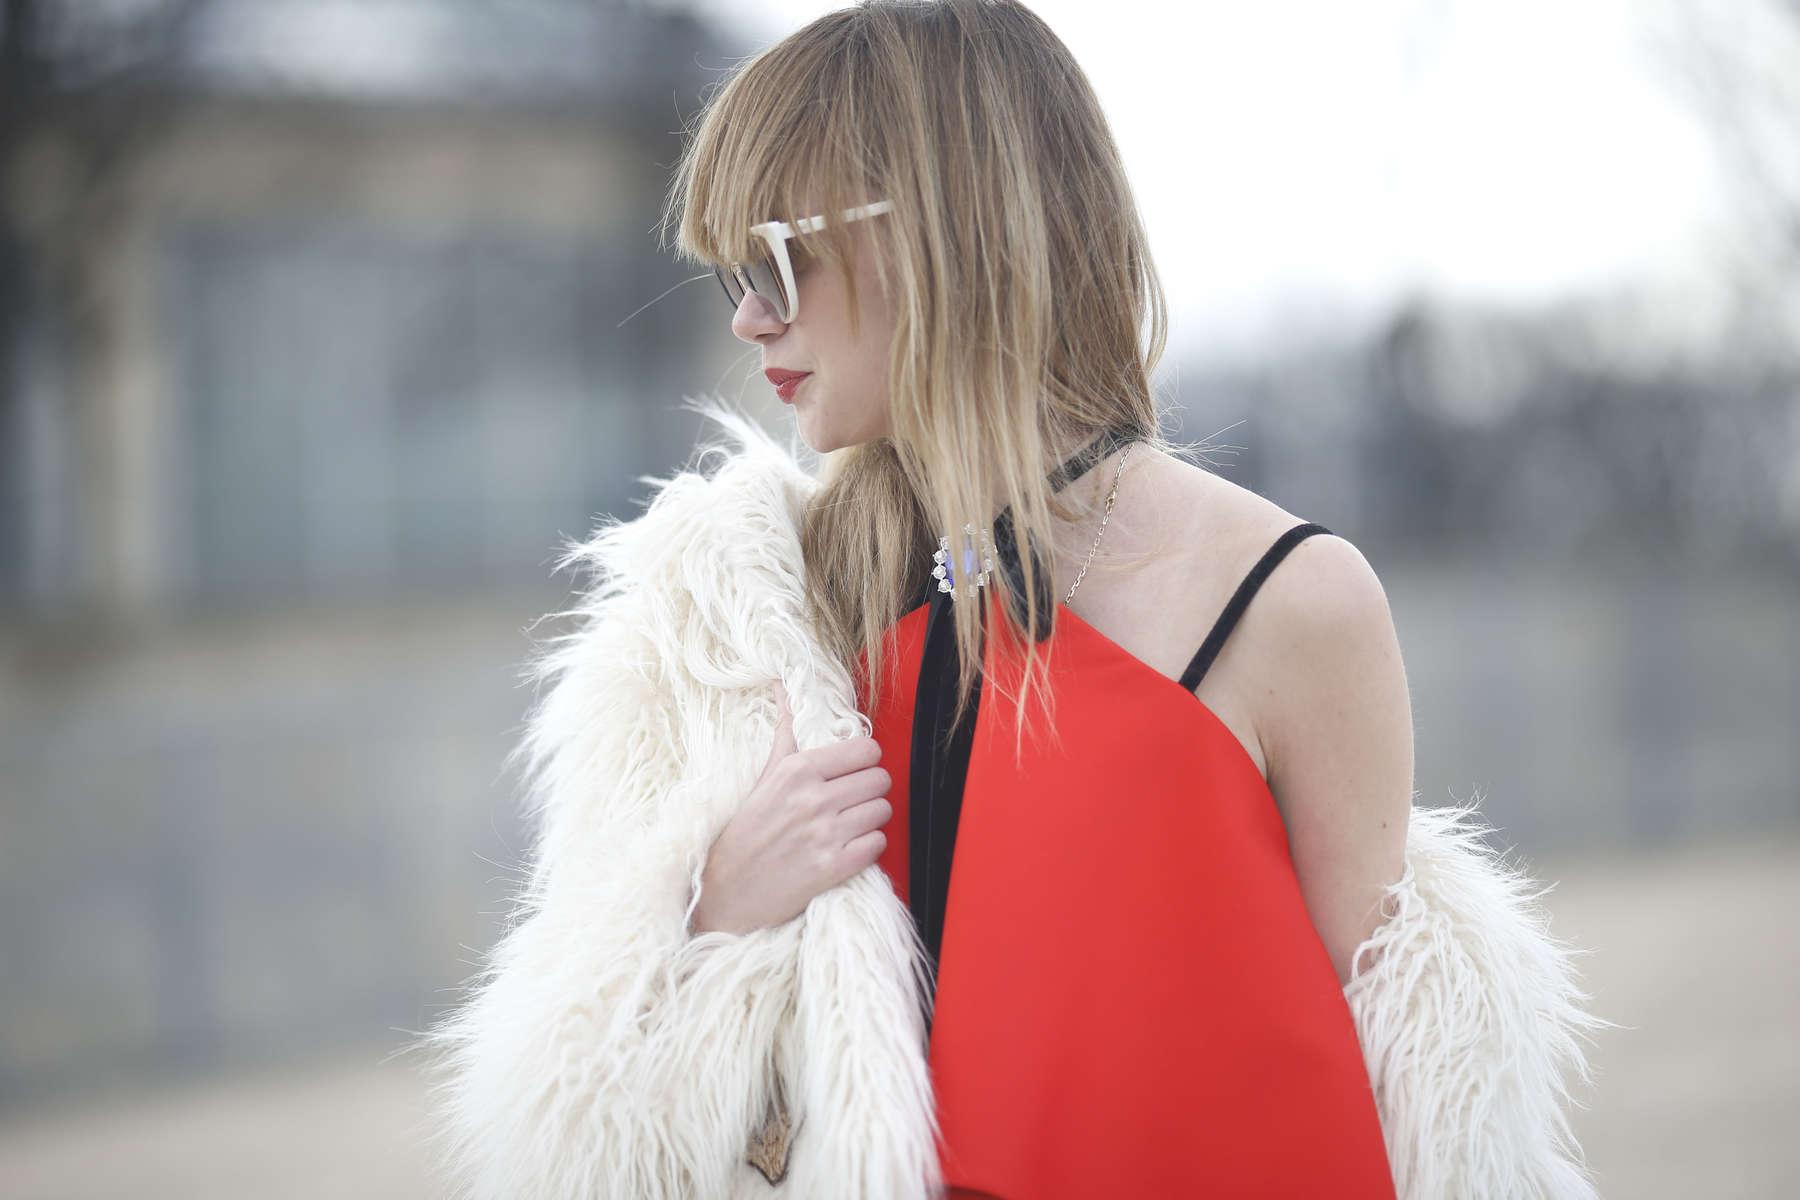 Anastasiia Masiutkina - Paris Fashion Week, March 2016